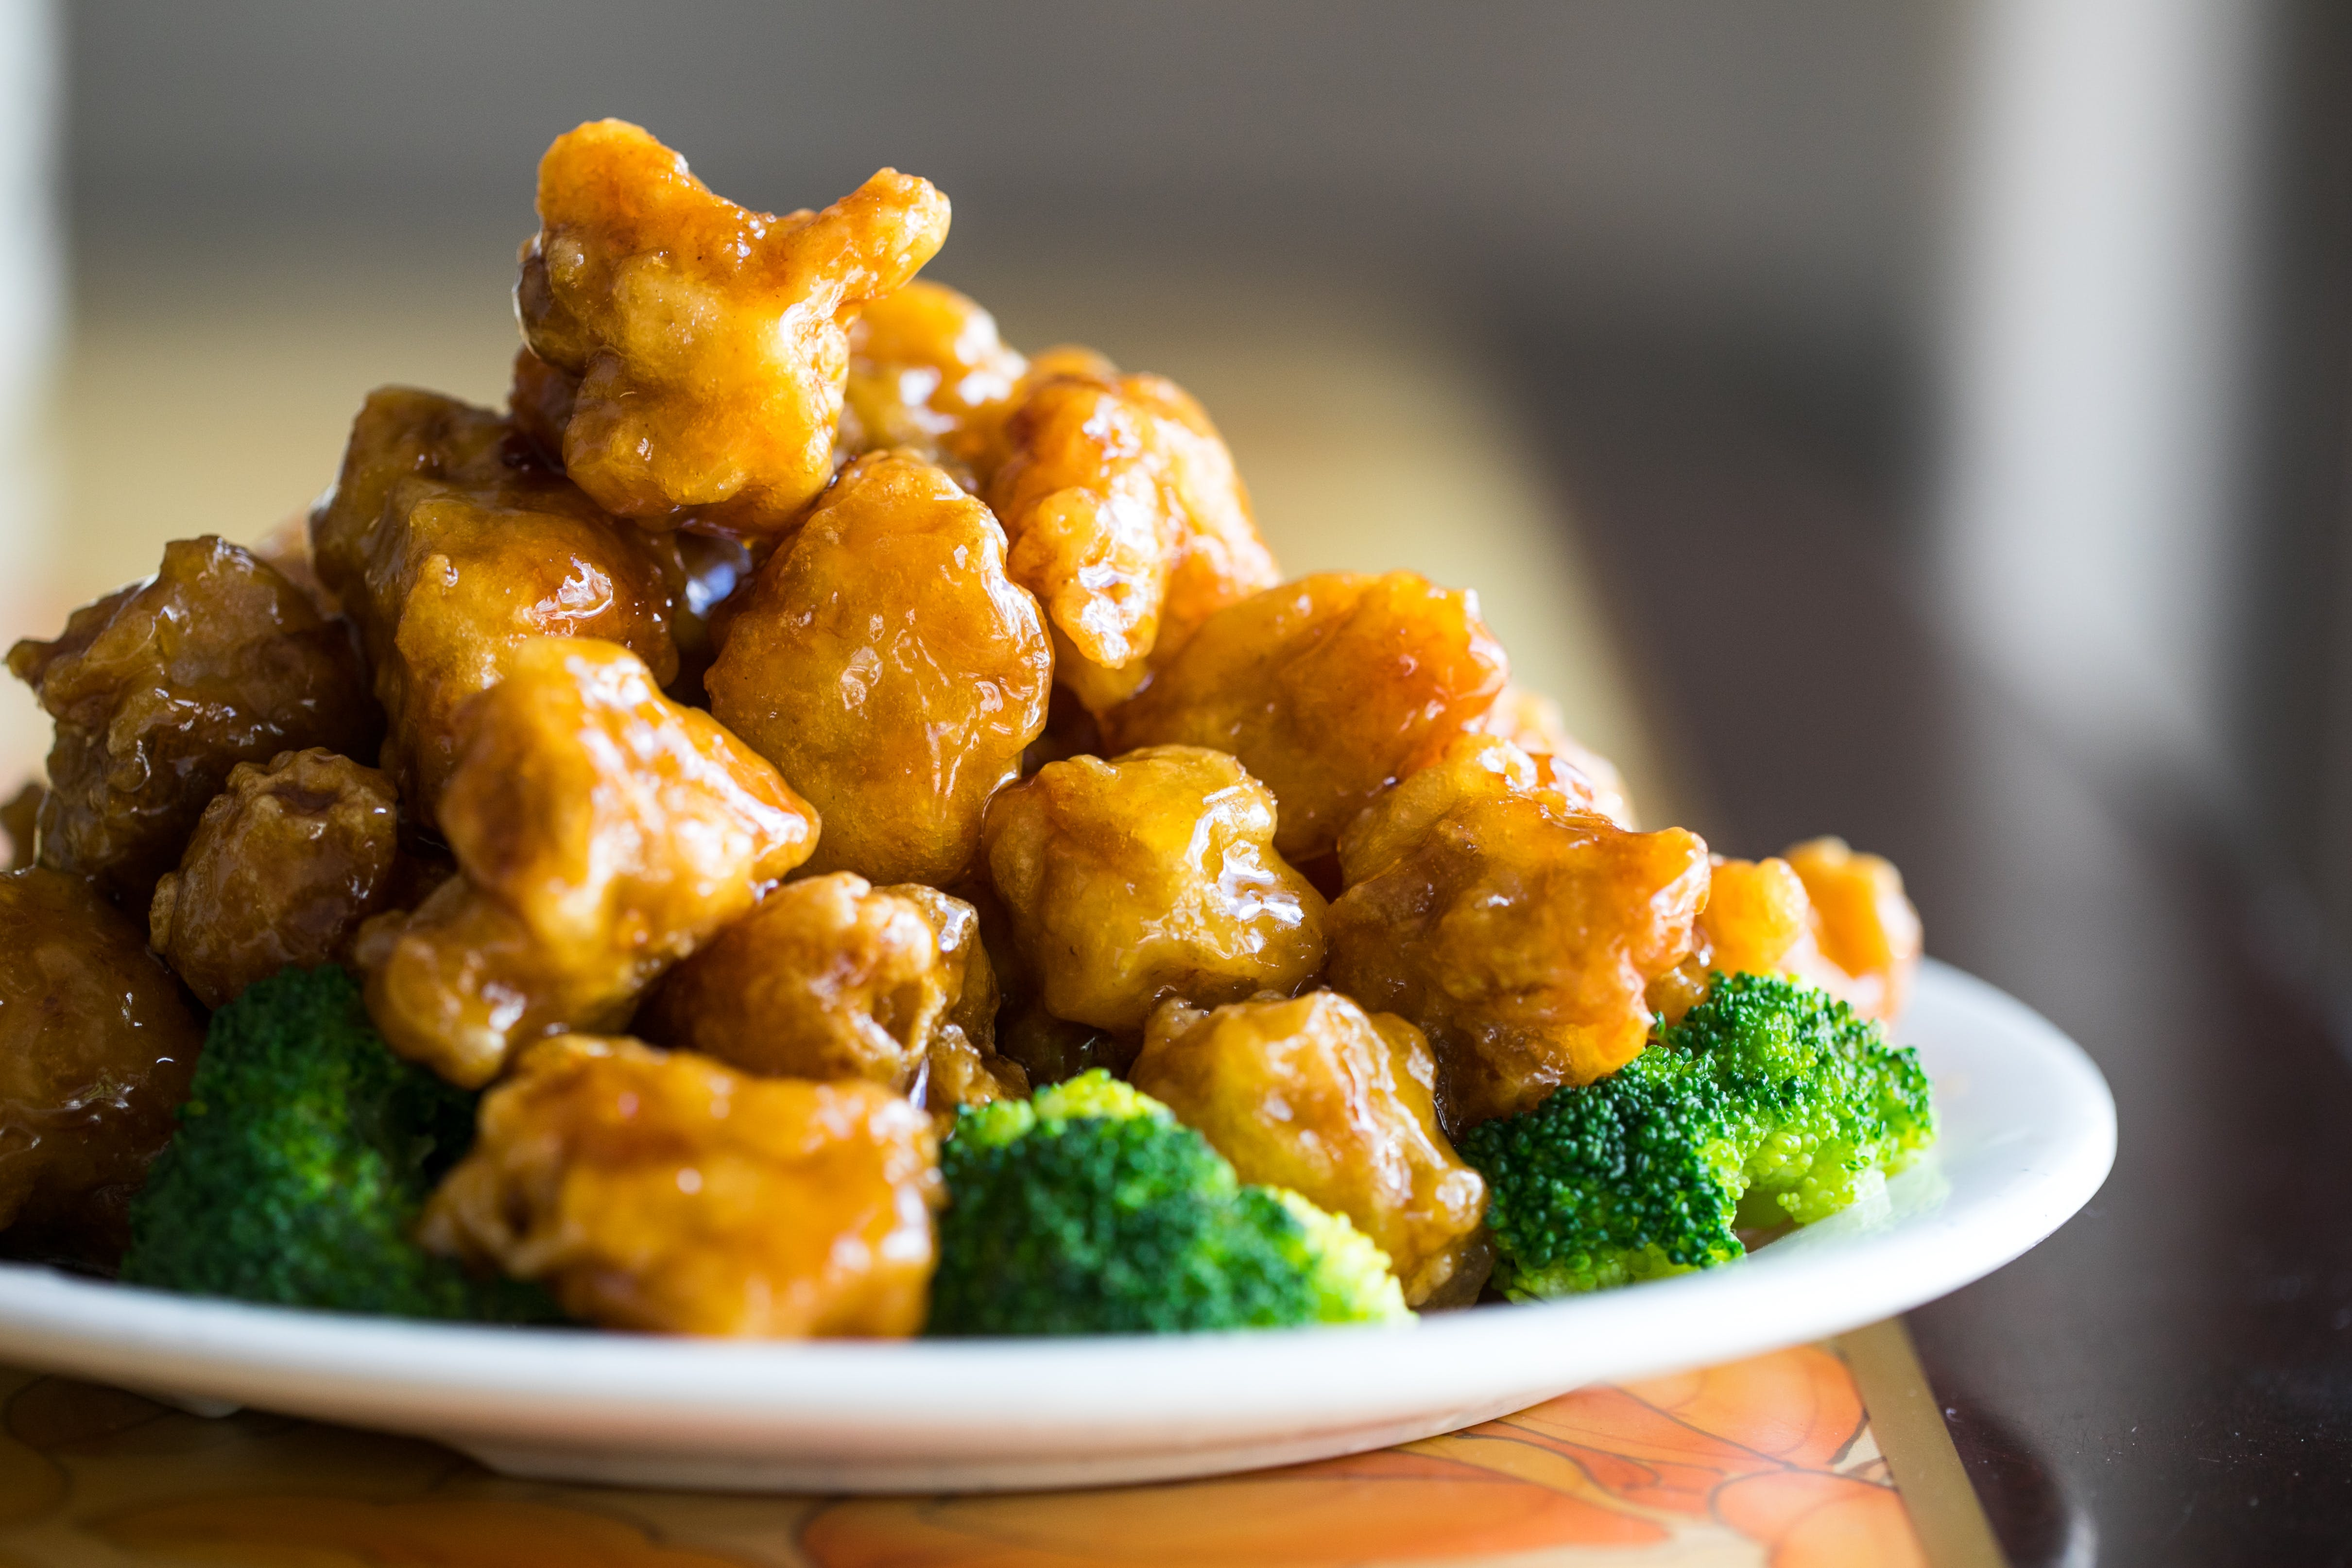 L14. General Tso's Chicken from Good Taste Chinese Restaurant in Richmond, VA